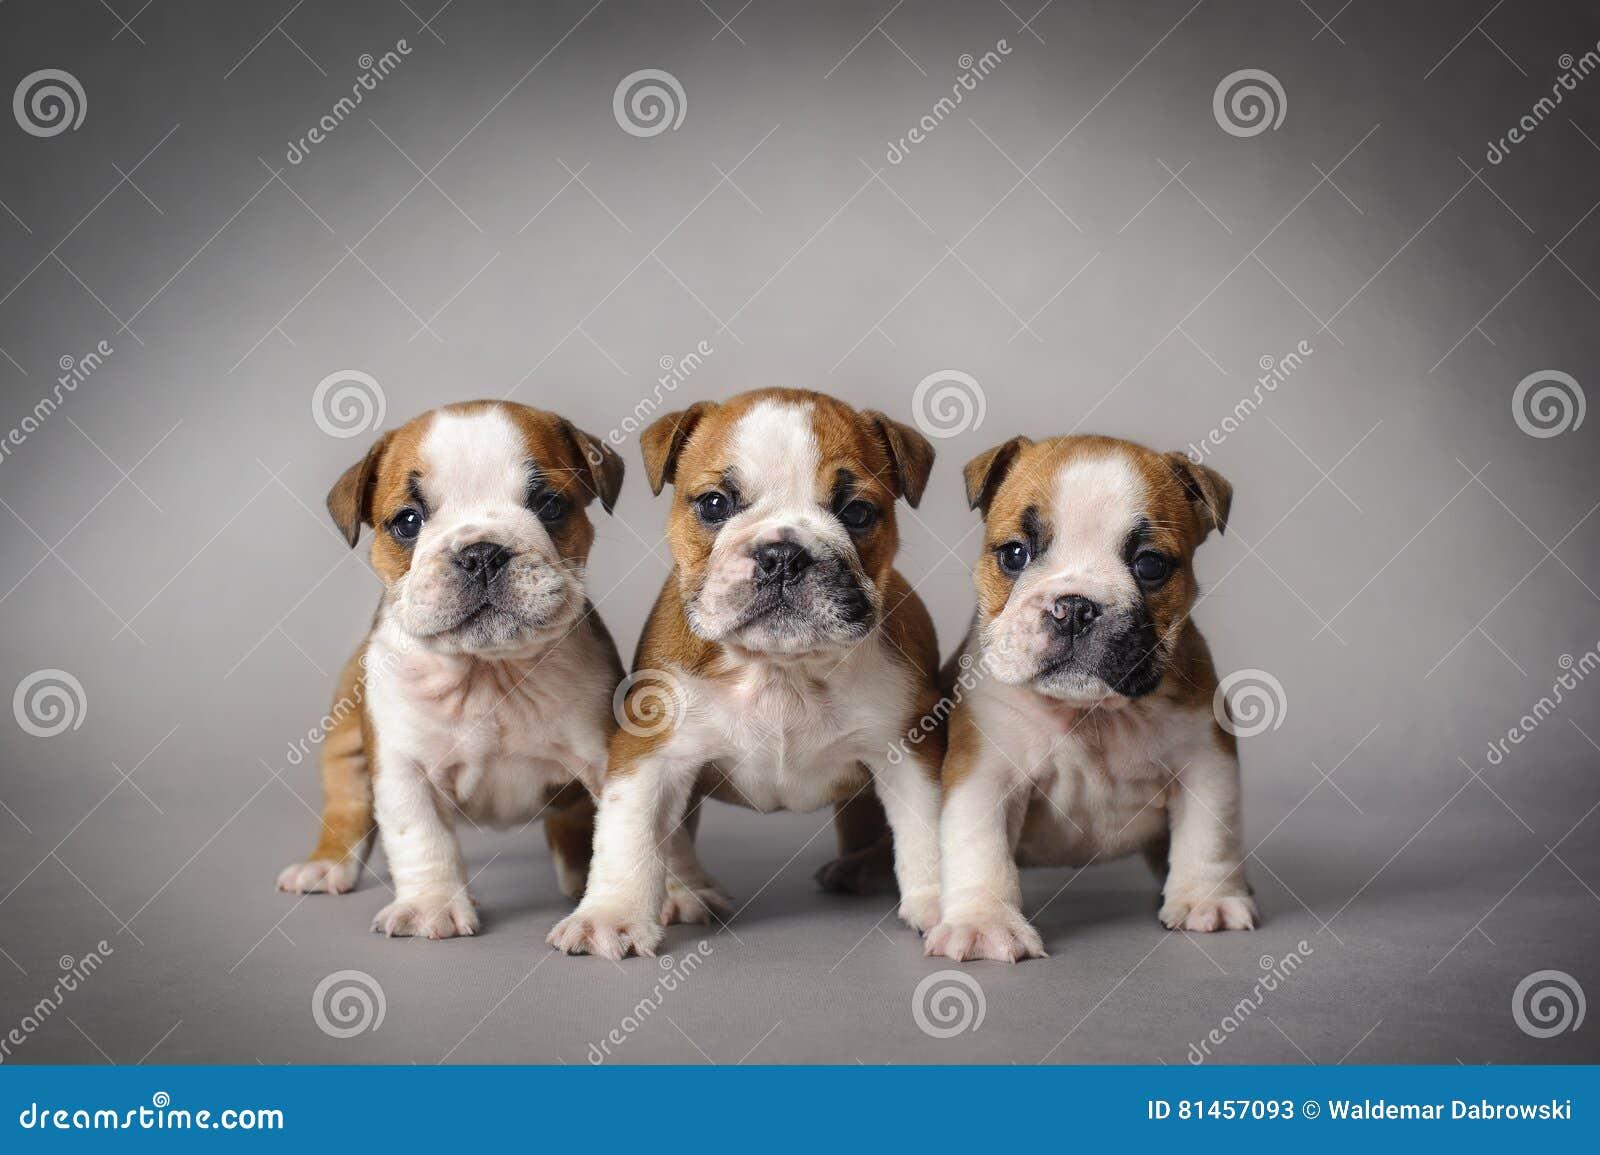 Bulldog Puppies Stock Image Image Of Household Relationship 81457093